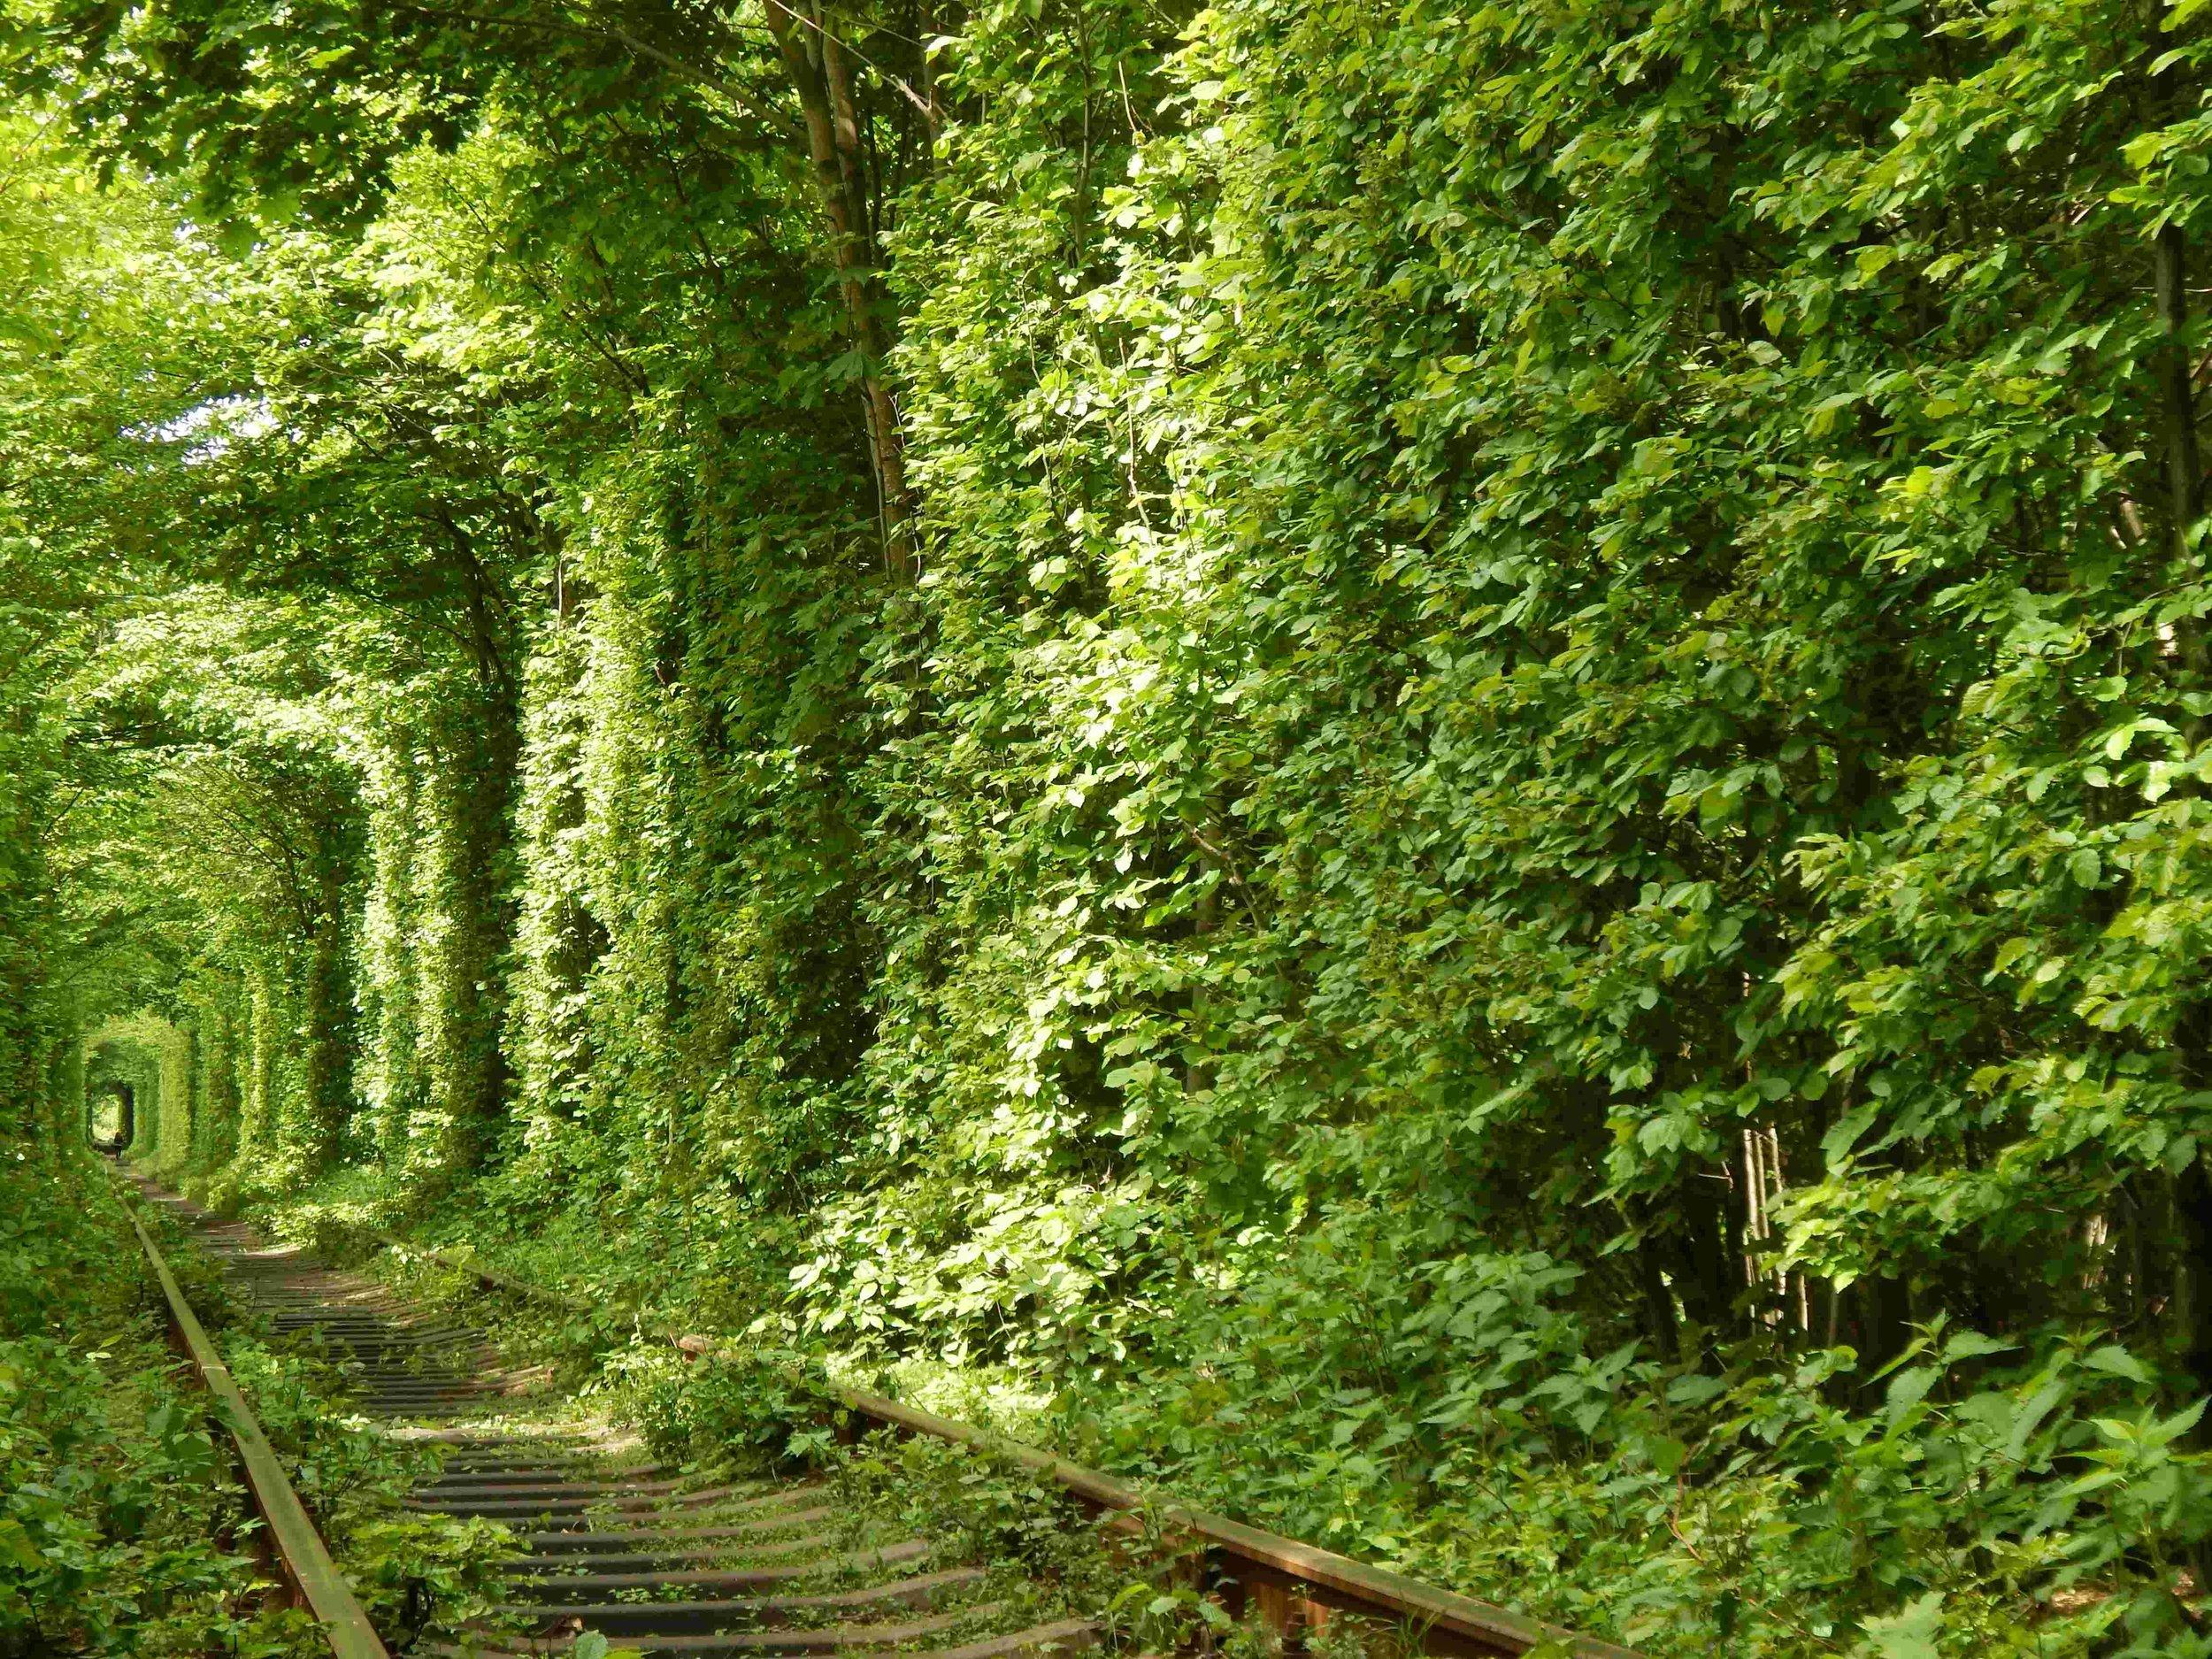 - The Tunnel of Love, Ukraine.